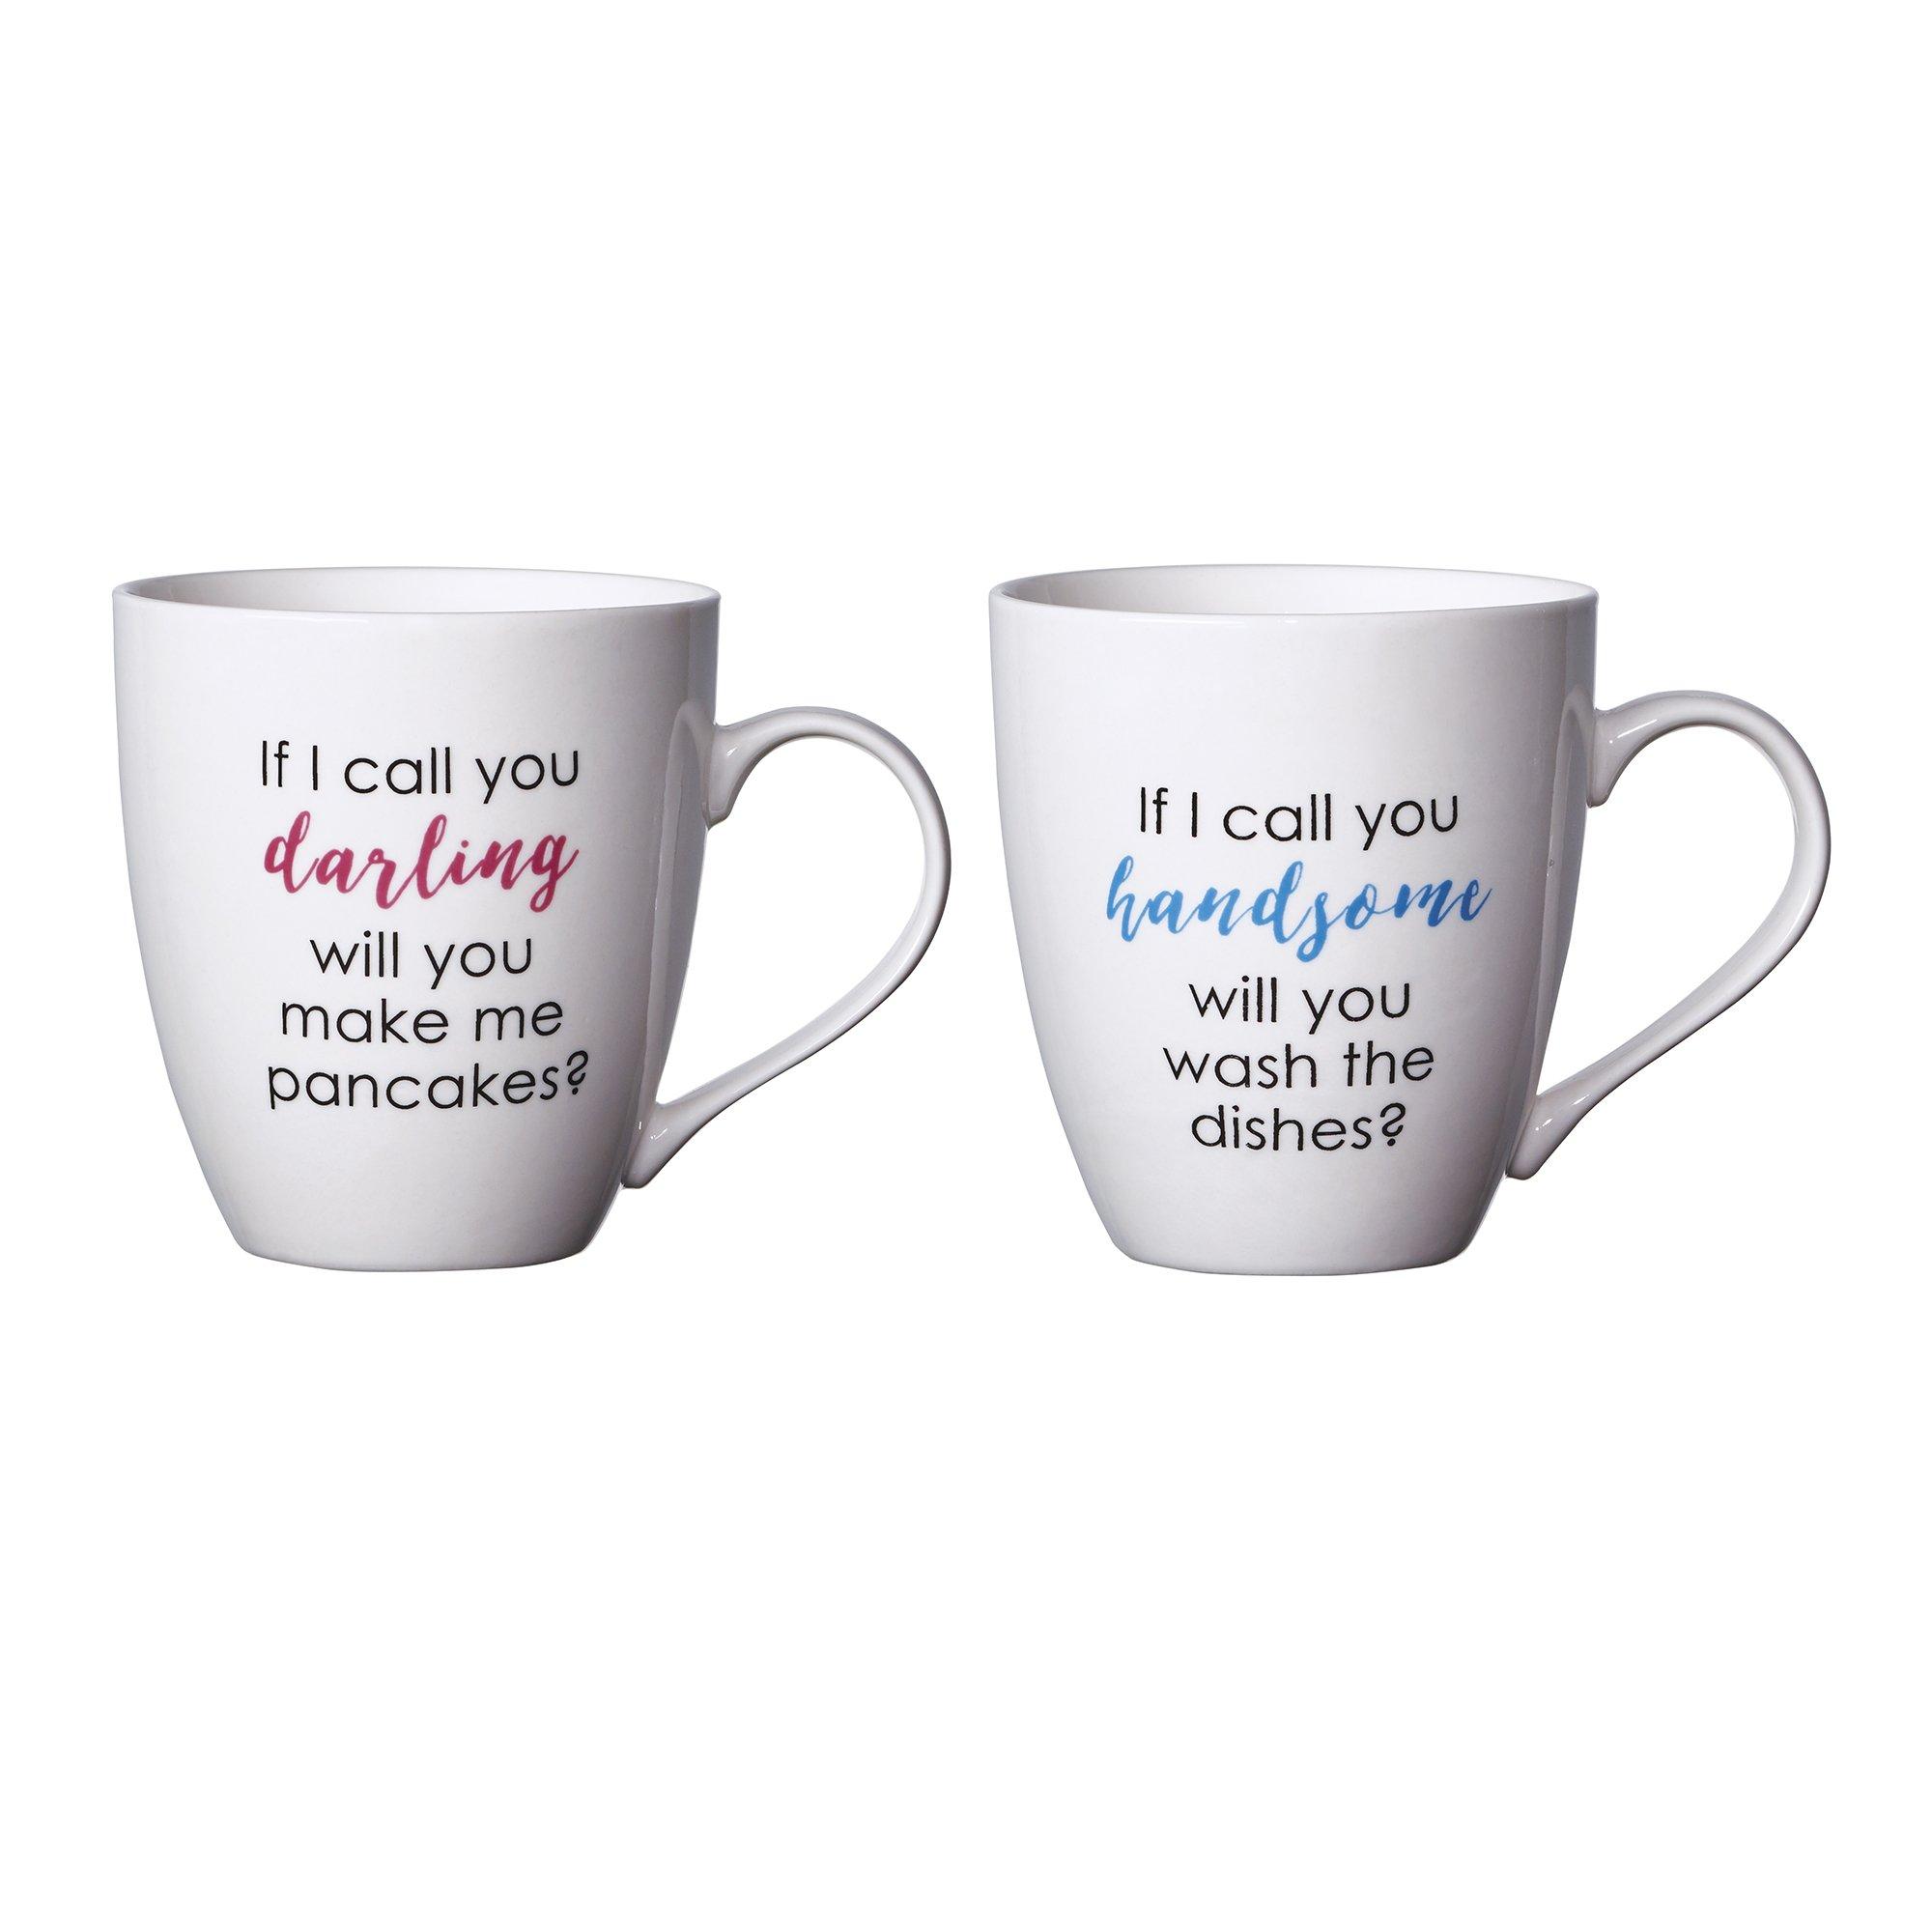 Pfaltzgraff Everyday Mug, Handsome and Darling, 18-Ounce, Set Of 2